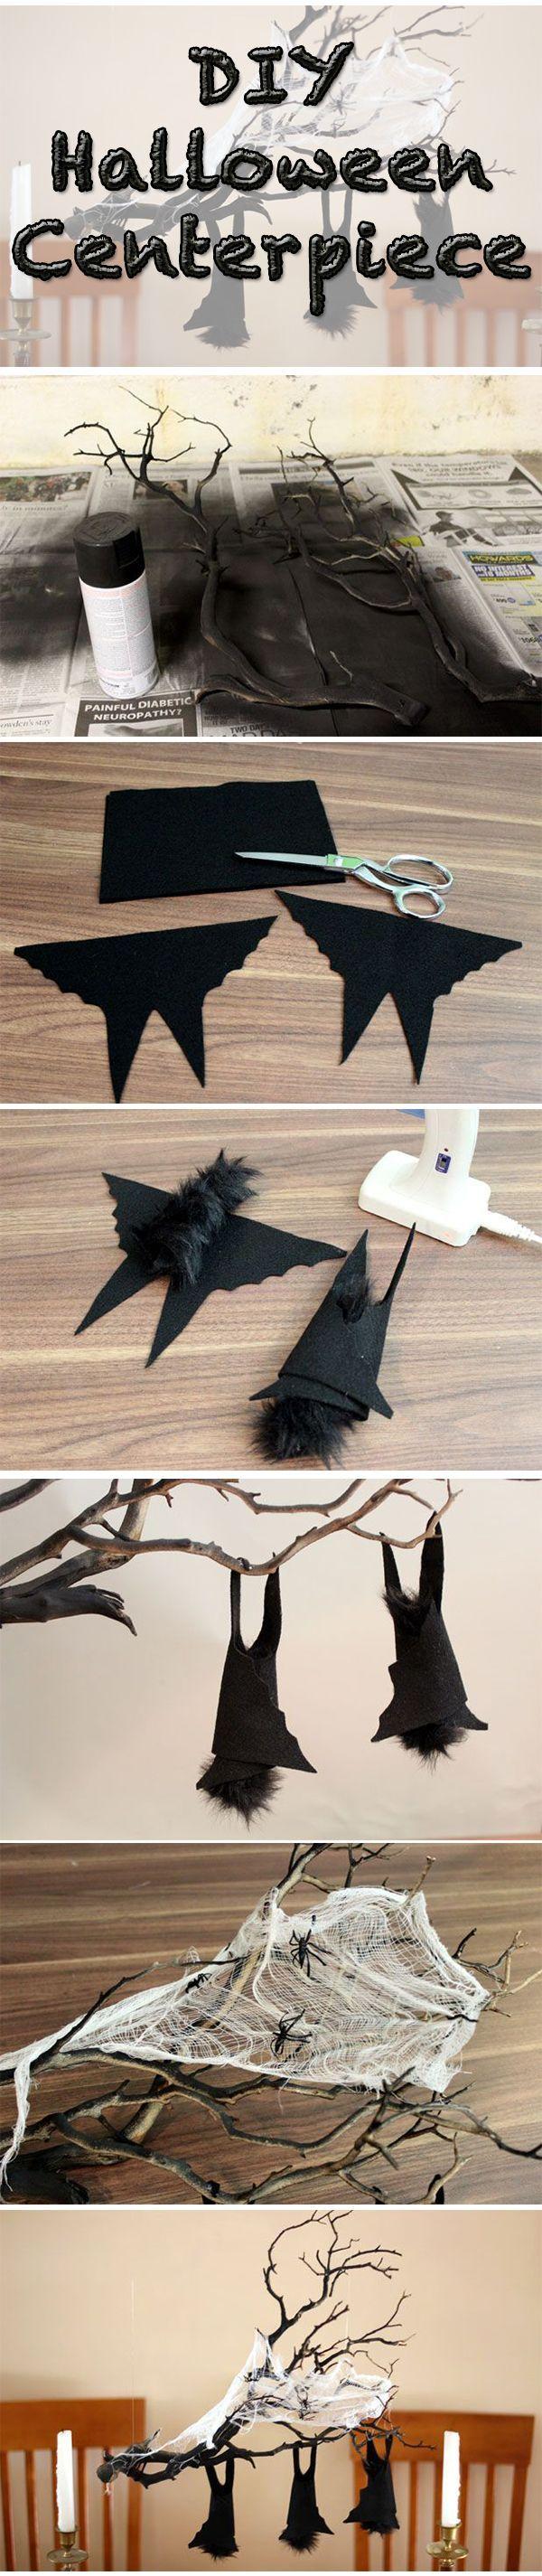 Tutorial centro de mesa suspenso para halloween, com morcegos